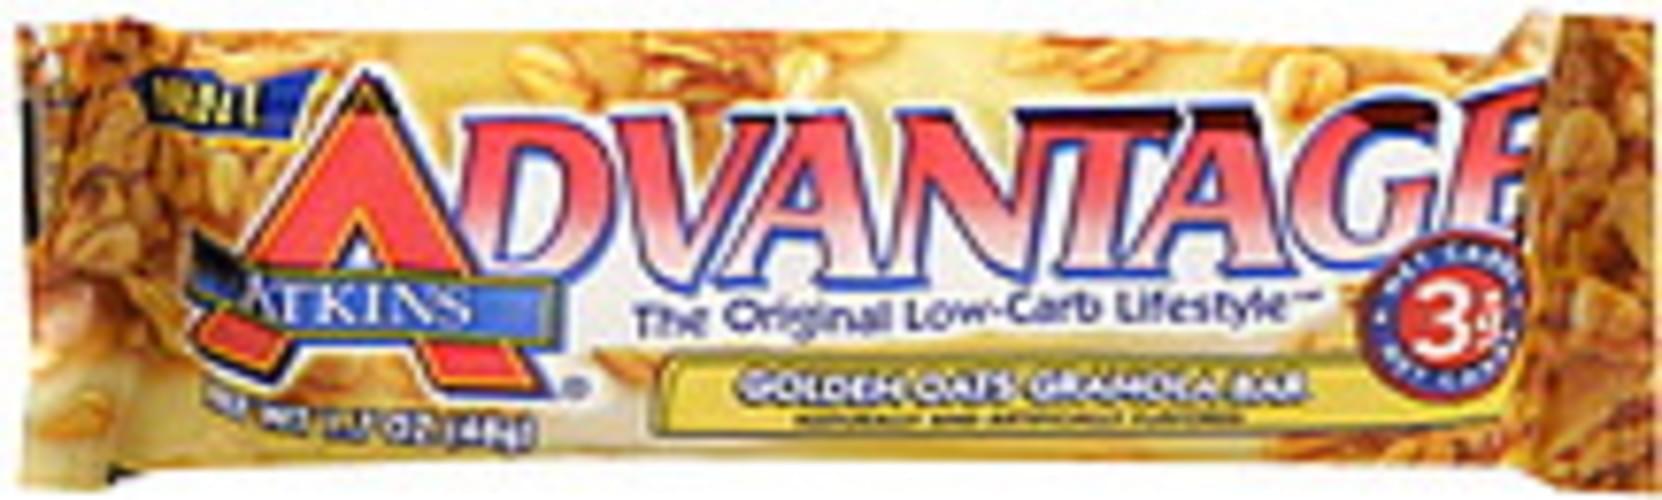 Atkins Golden Oats Granola Bar - 1.7 oz